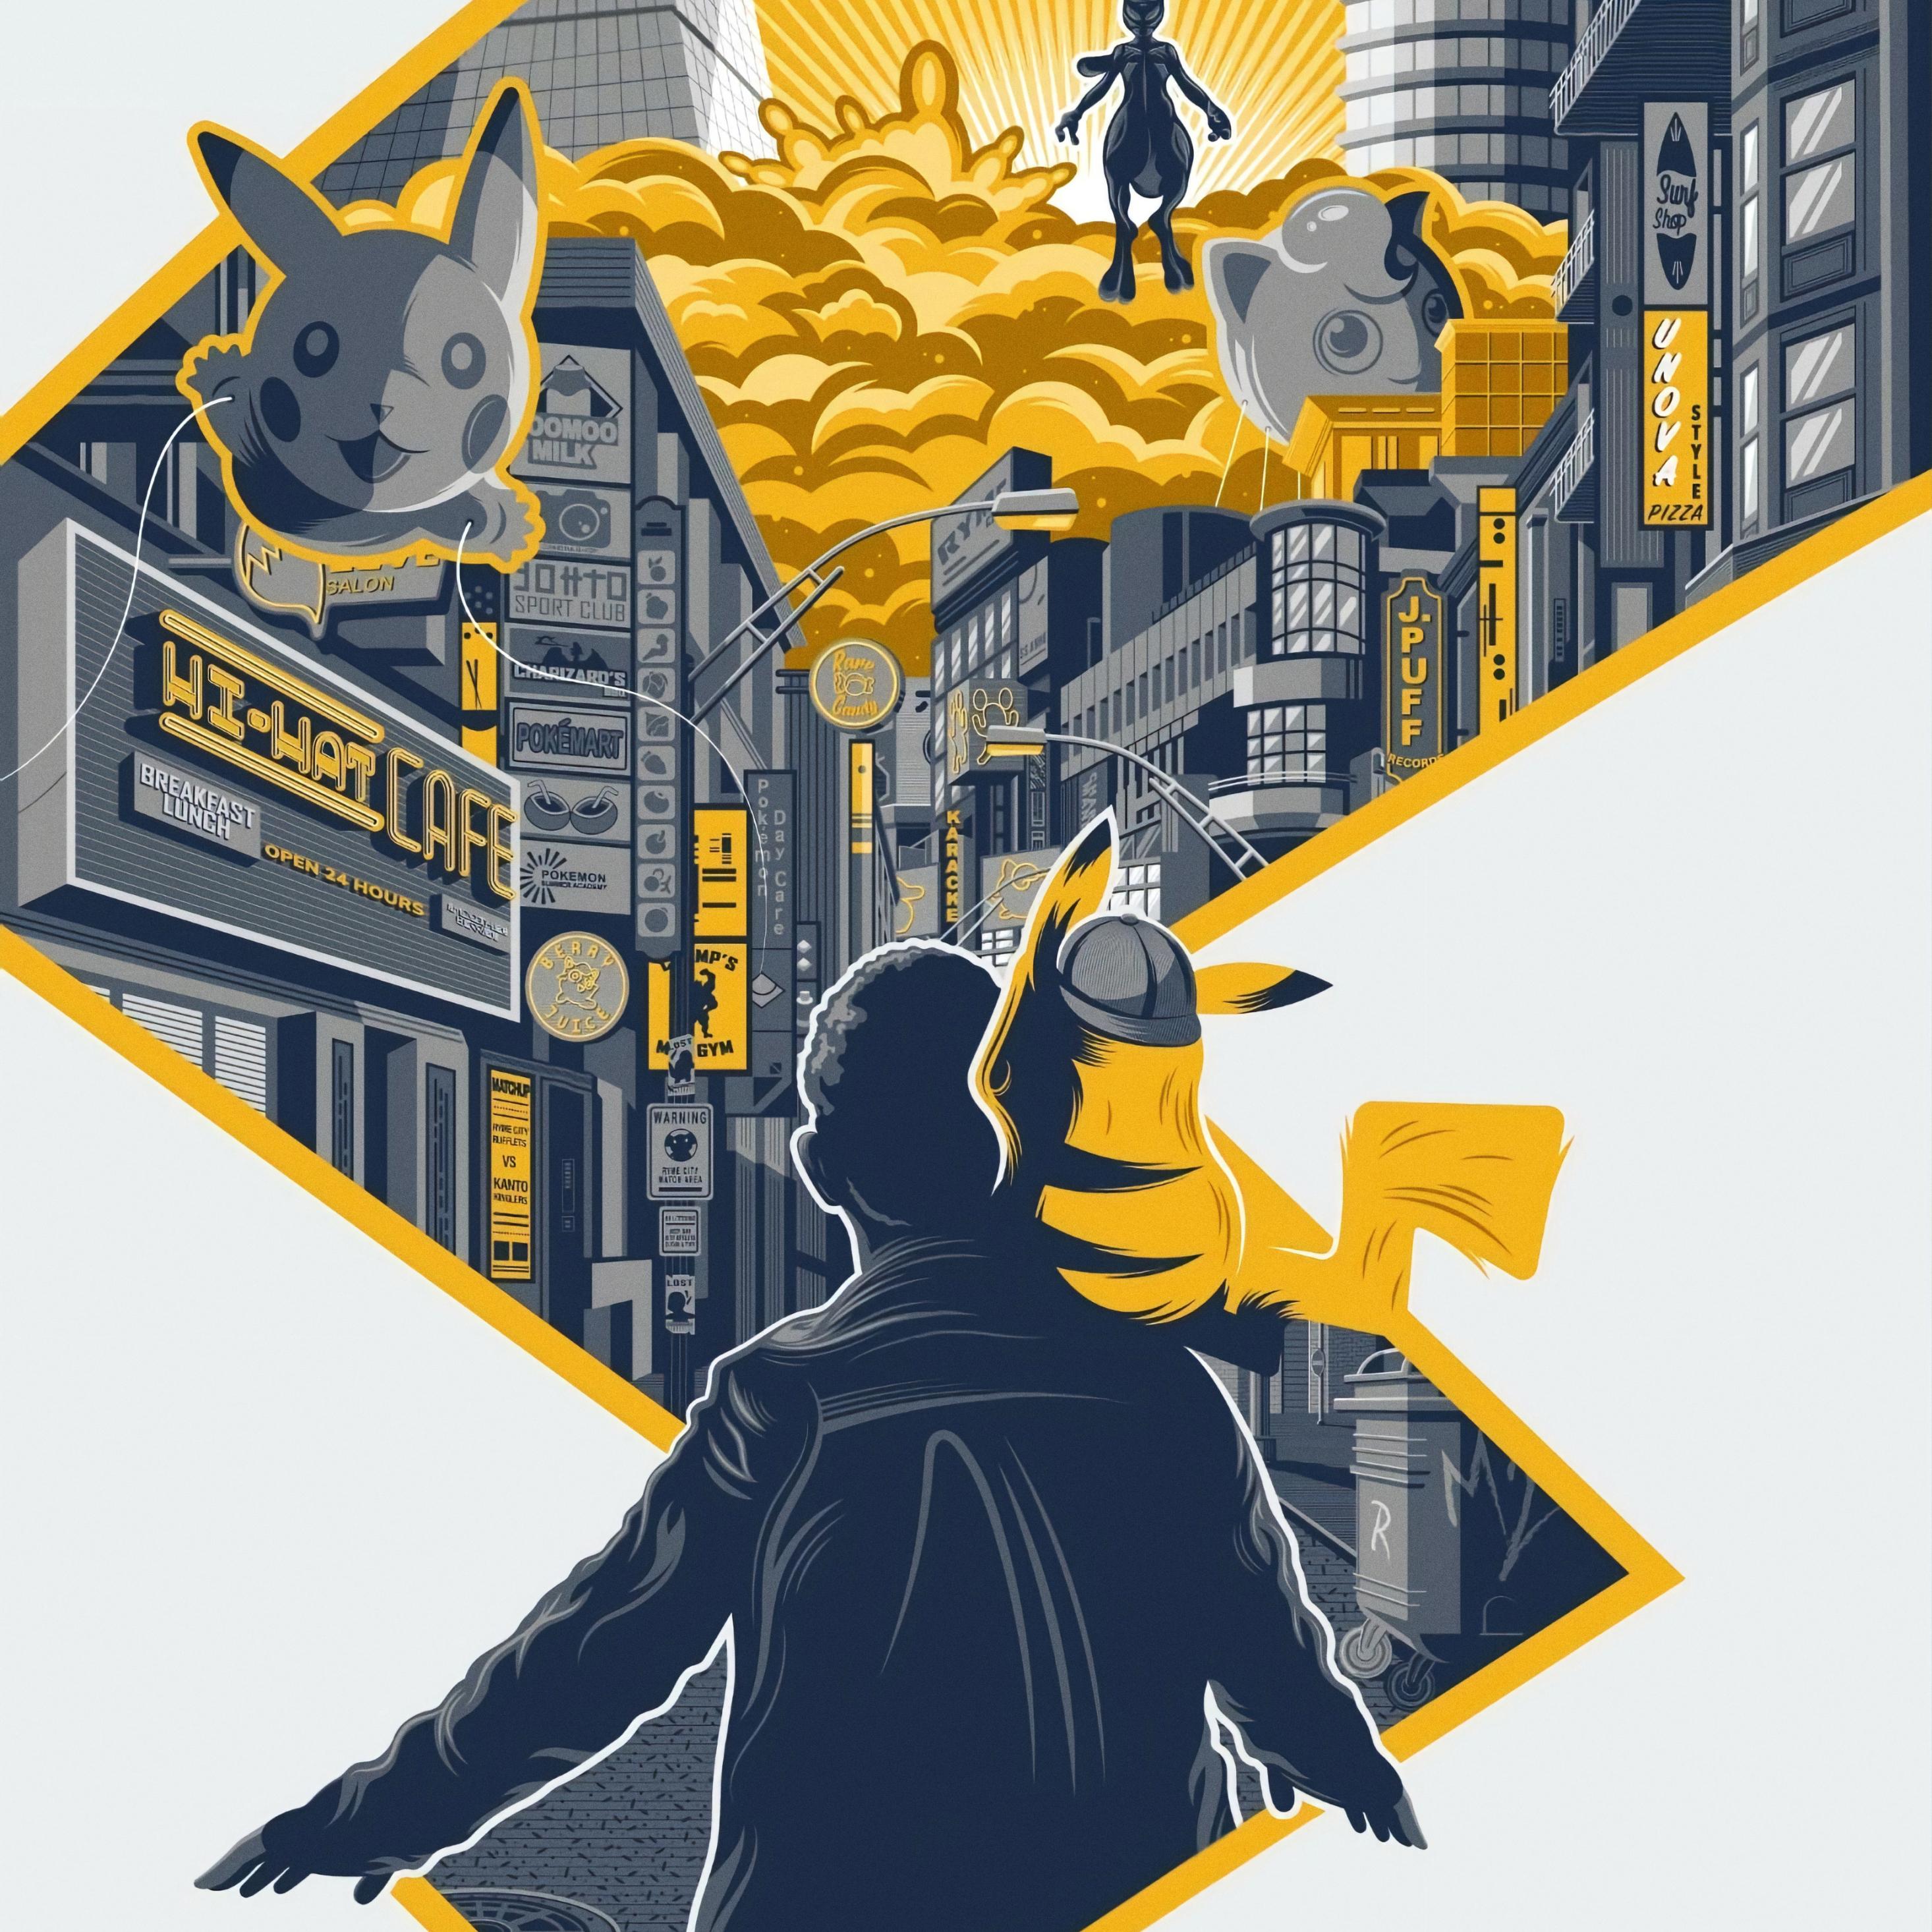 2932x2932 New Pokemon Detective Pikachu Movie Poster Ipad Pro